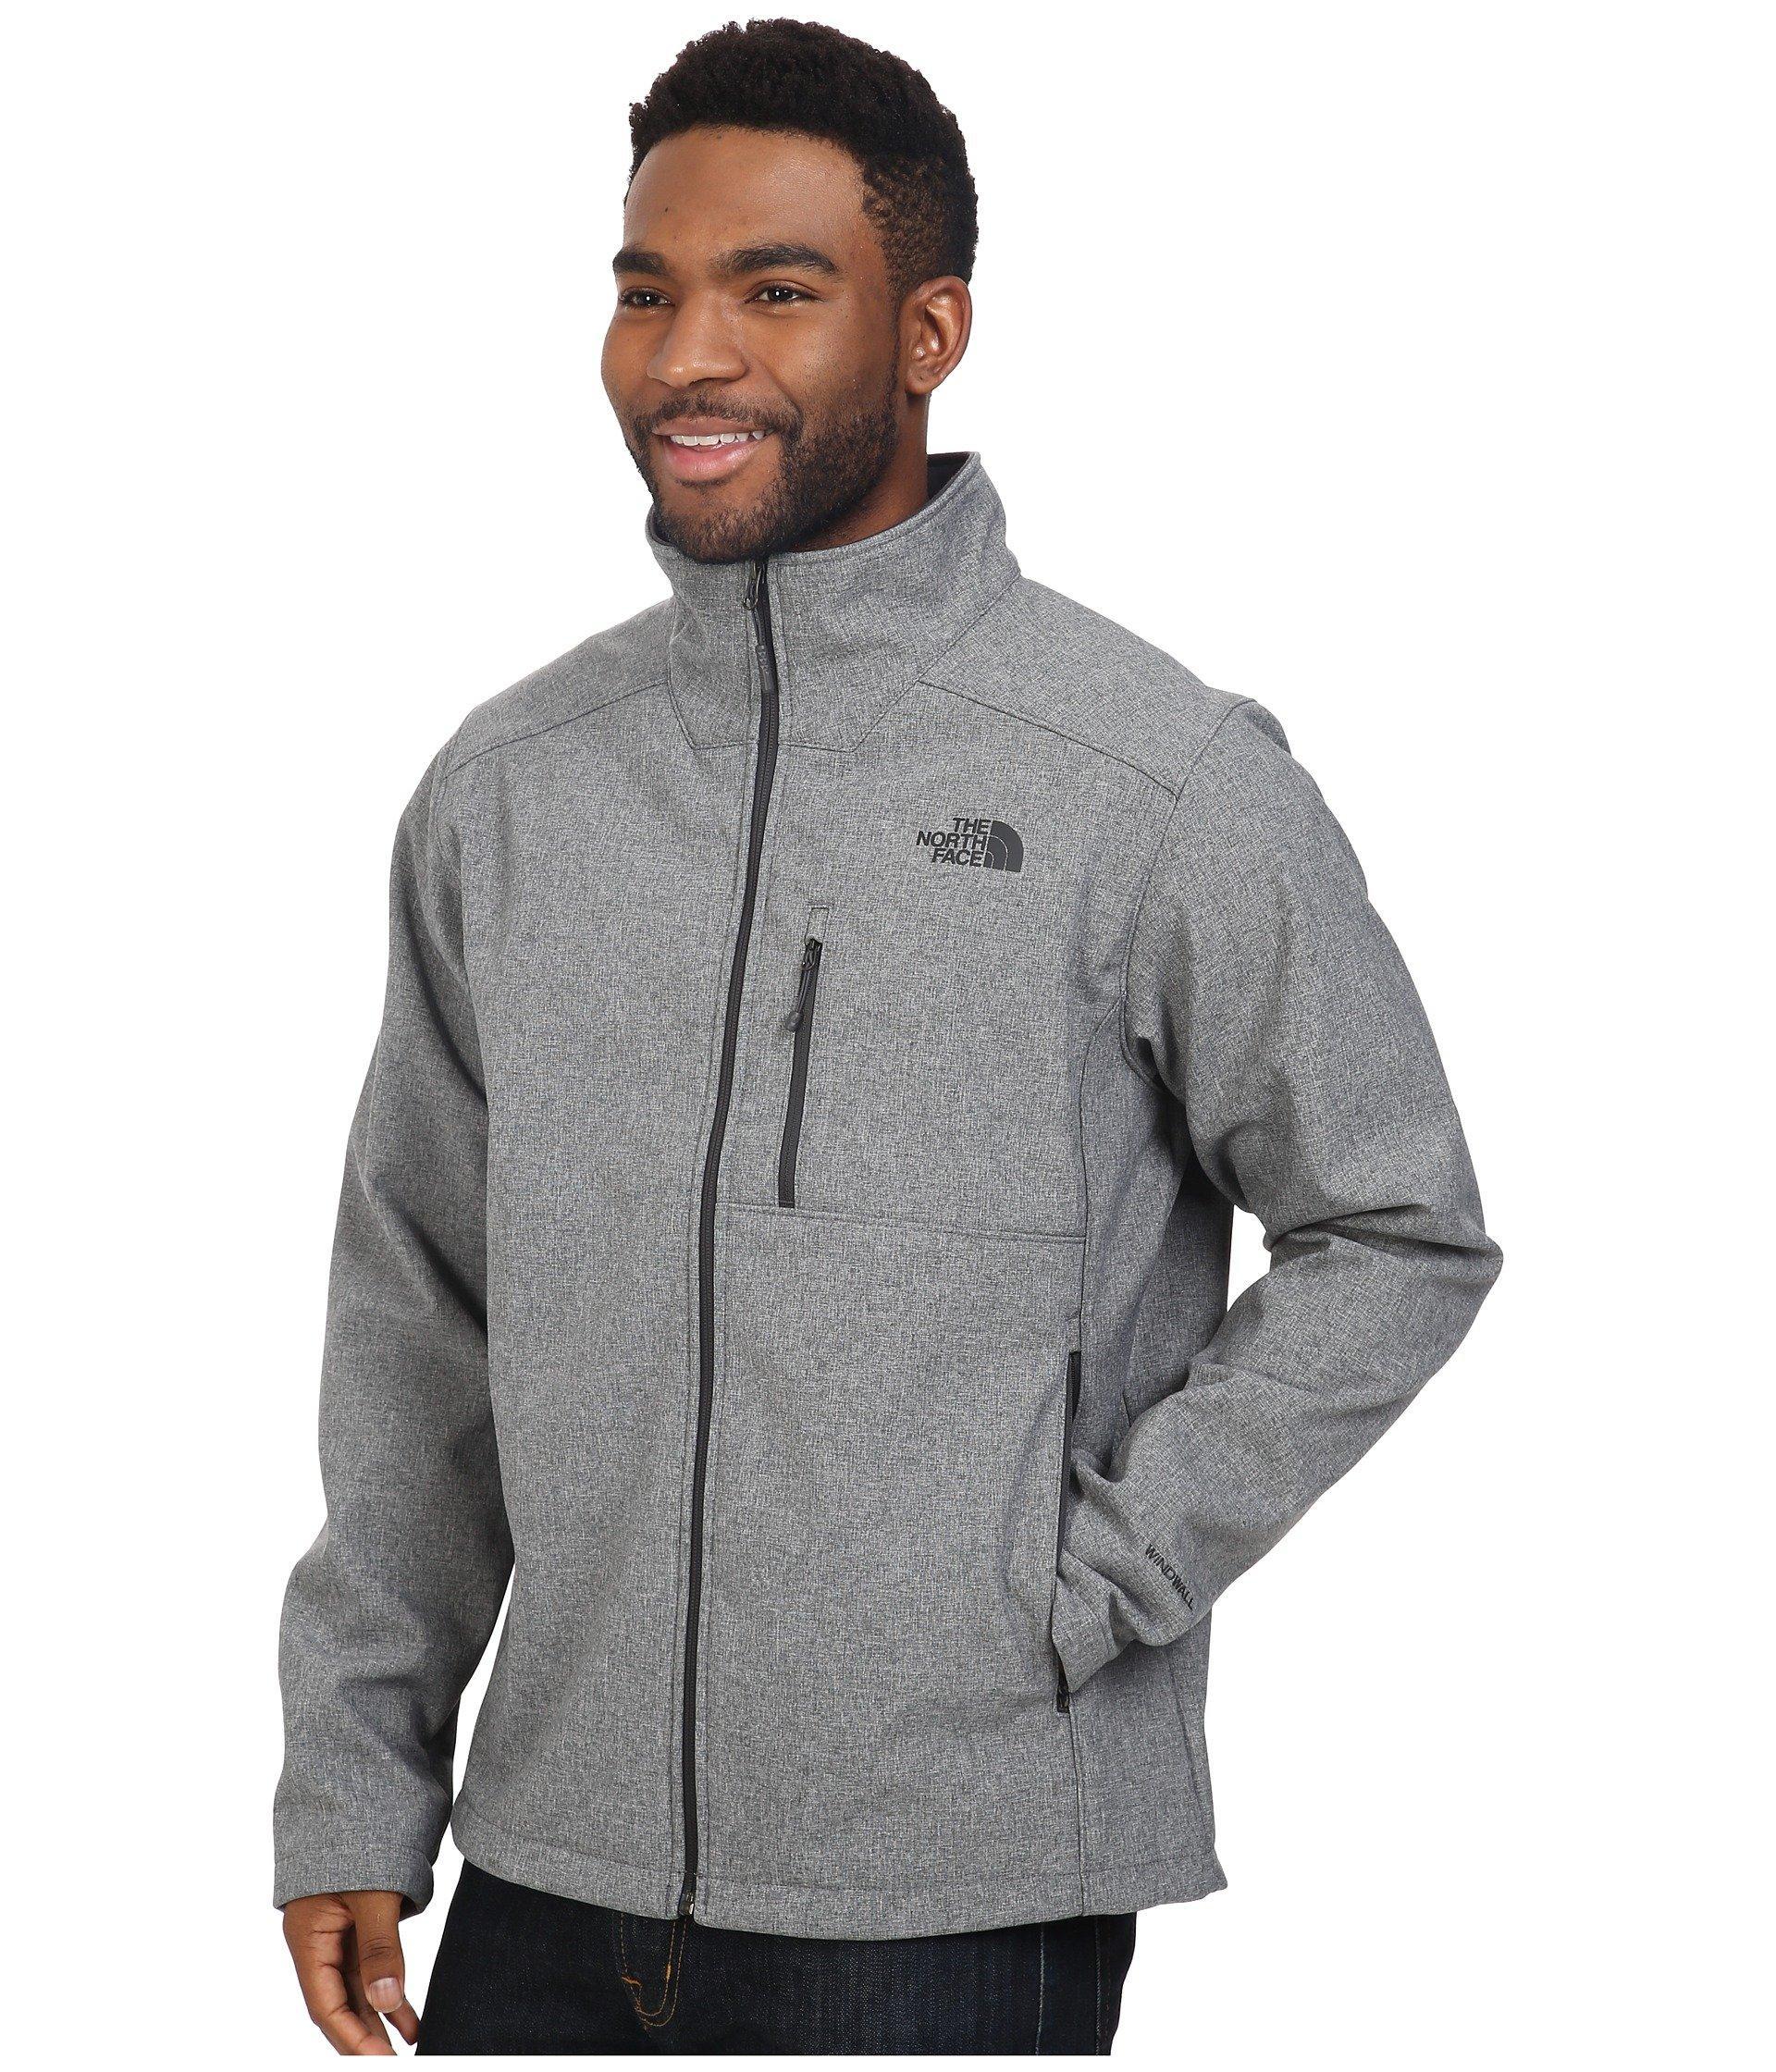 64ab57bcfe0 Lyst - The North Face Apex Bionic 2 Jacket - Tall (tnf Medium Grey Heather  tnf Medium Grey Heather) Men s Coat in Gray for Men - Save 59%